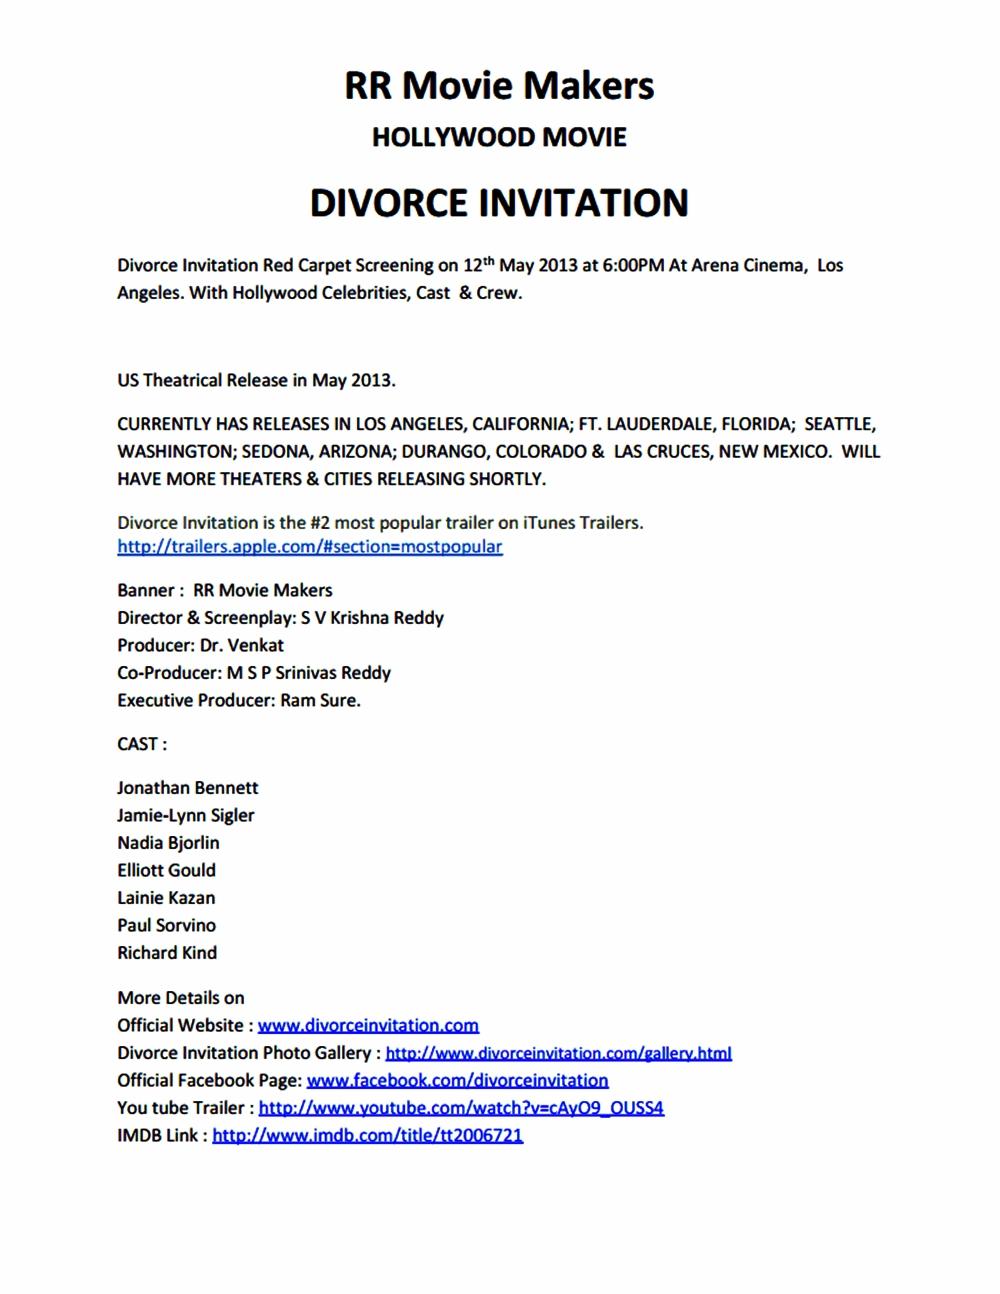 Divorce Invitation Movie Details Telugu Movies Nandamuri Fans